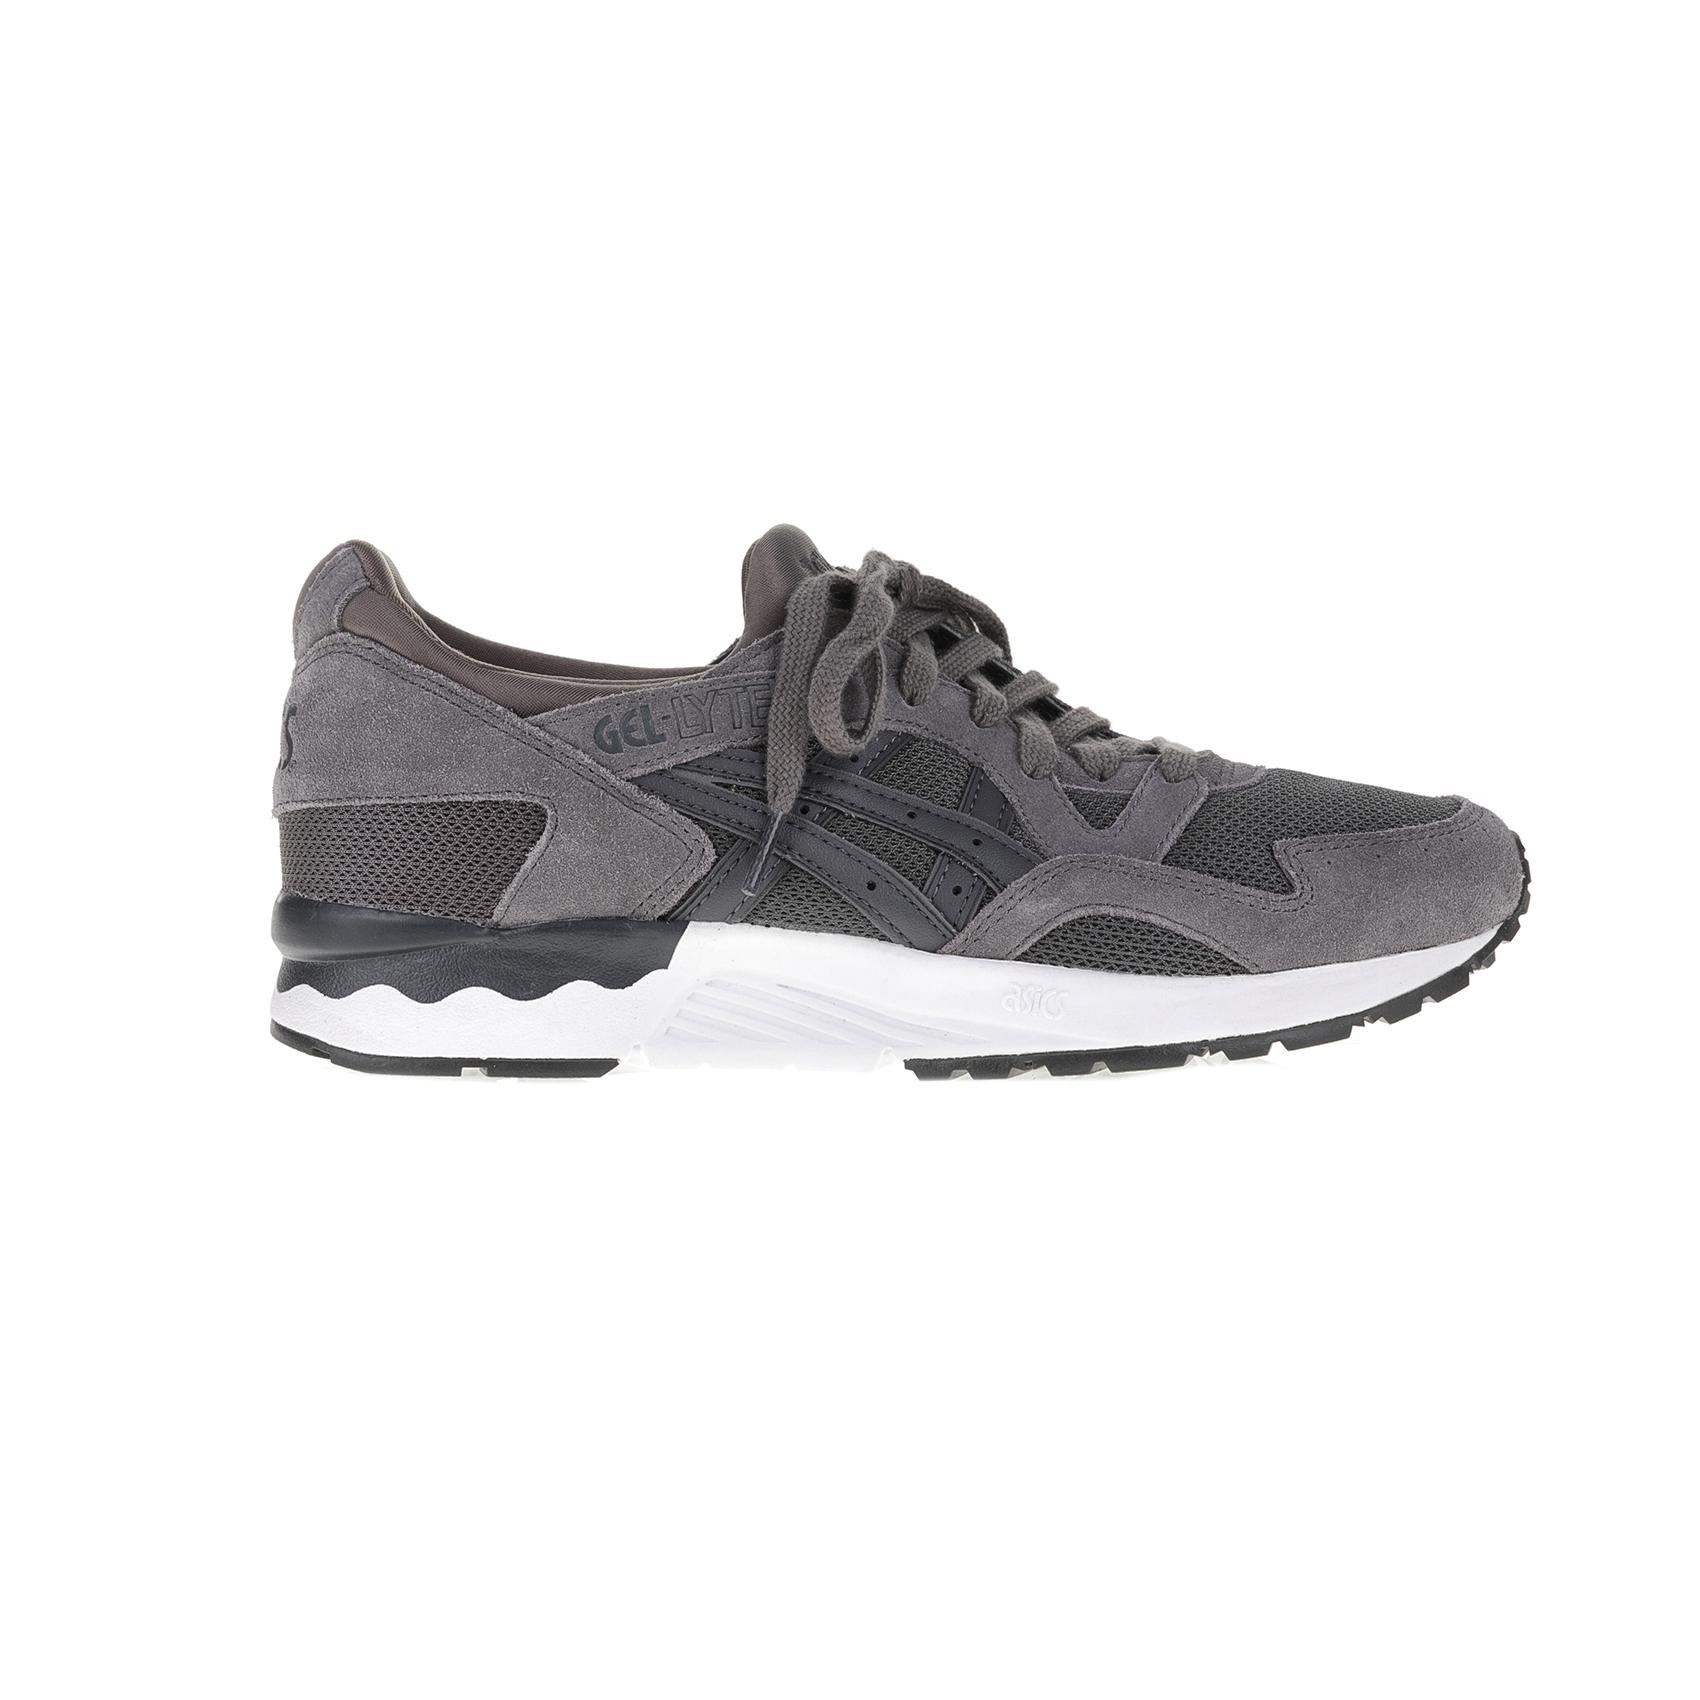 ASICS - Unisex παπούτσια GEL-LYTE V ASICS γκρι γυναικεία παπούτσια αθλητικά running